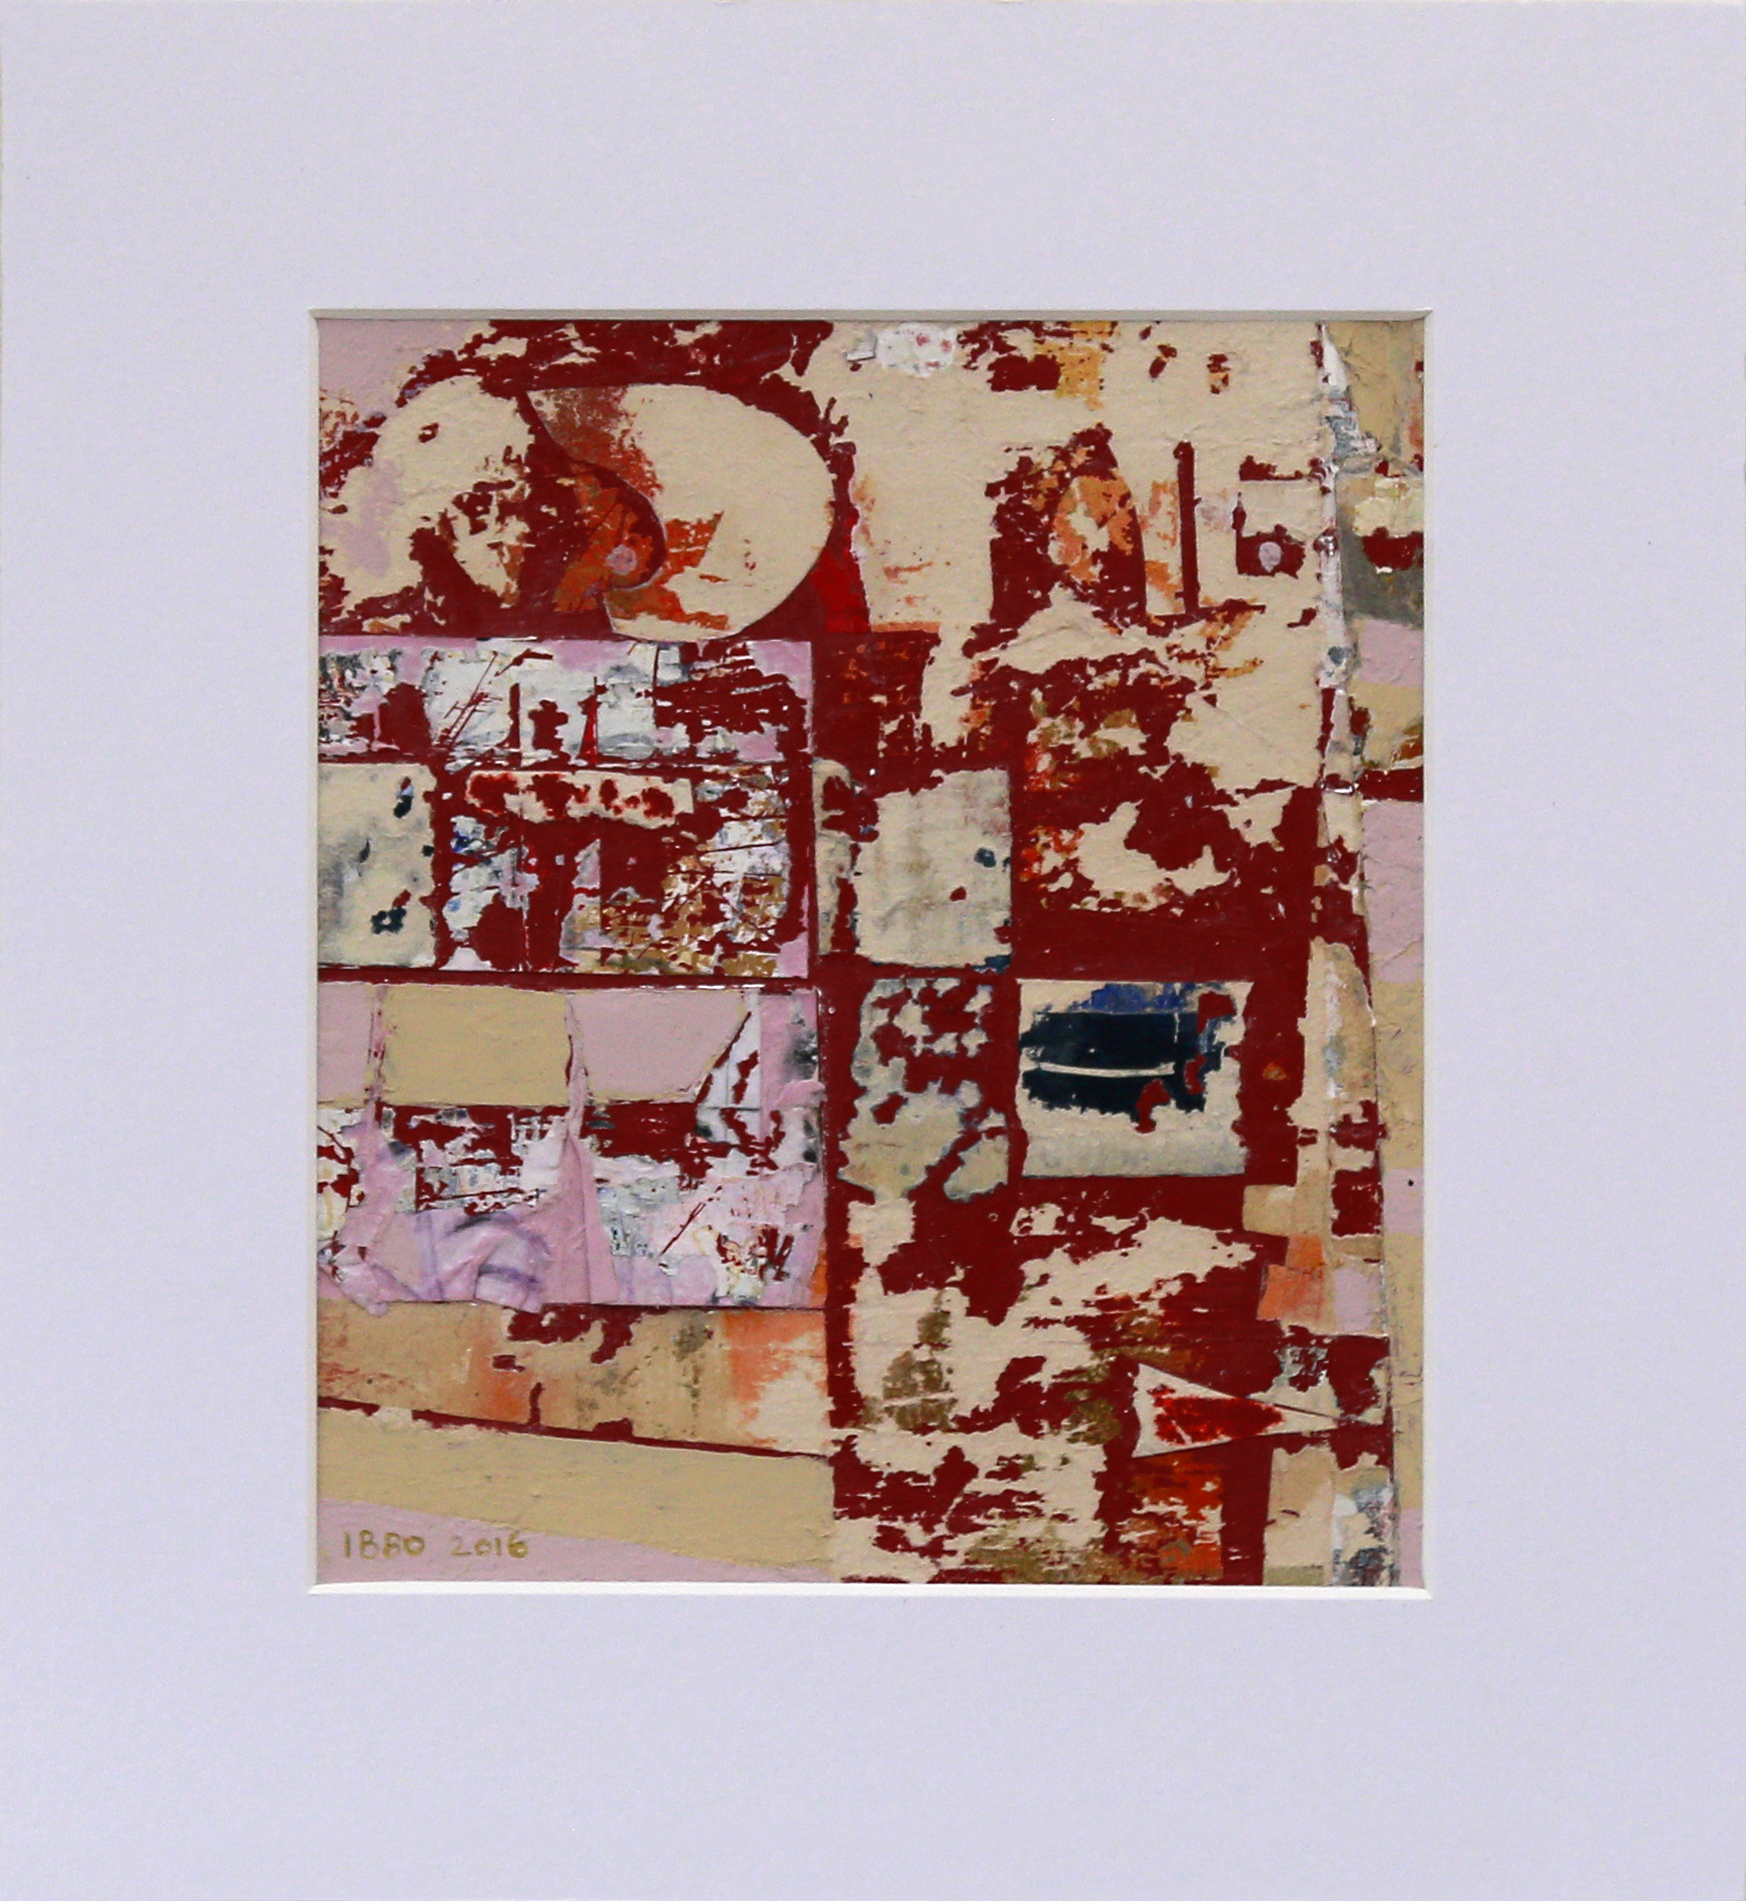 Music Pupils 17 x 20 cm Mixed media (28 x 30 cm mounted)